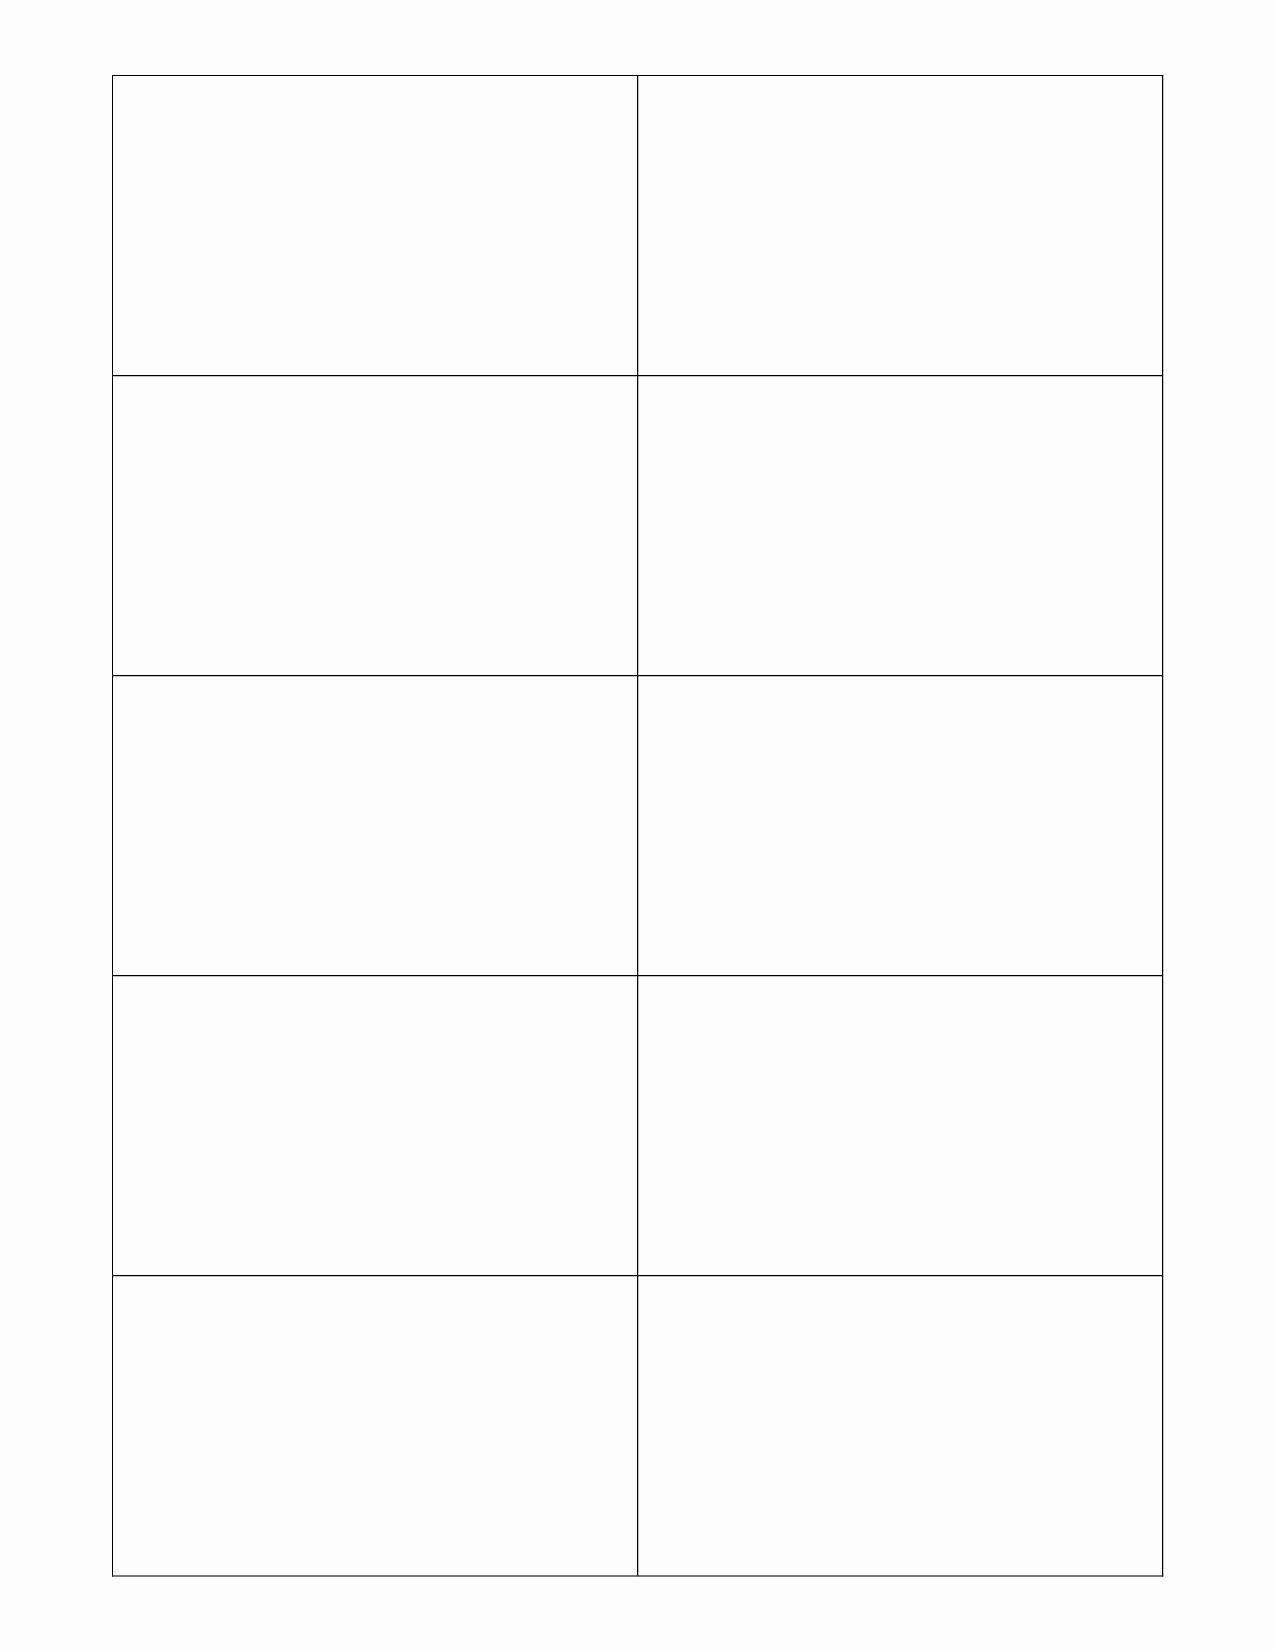 Business Card Template In Word Elegant Blank Business Card Template Beepmunk